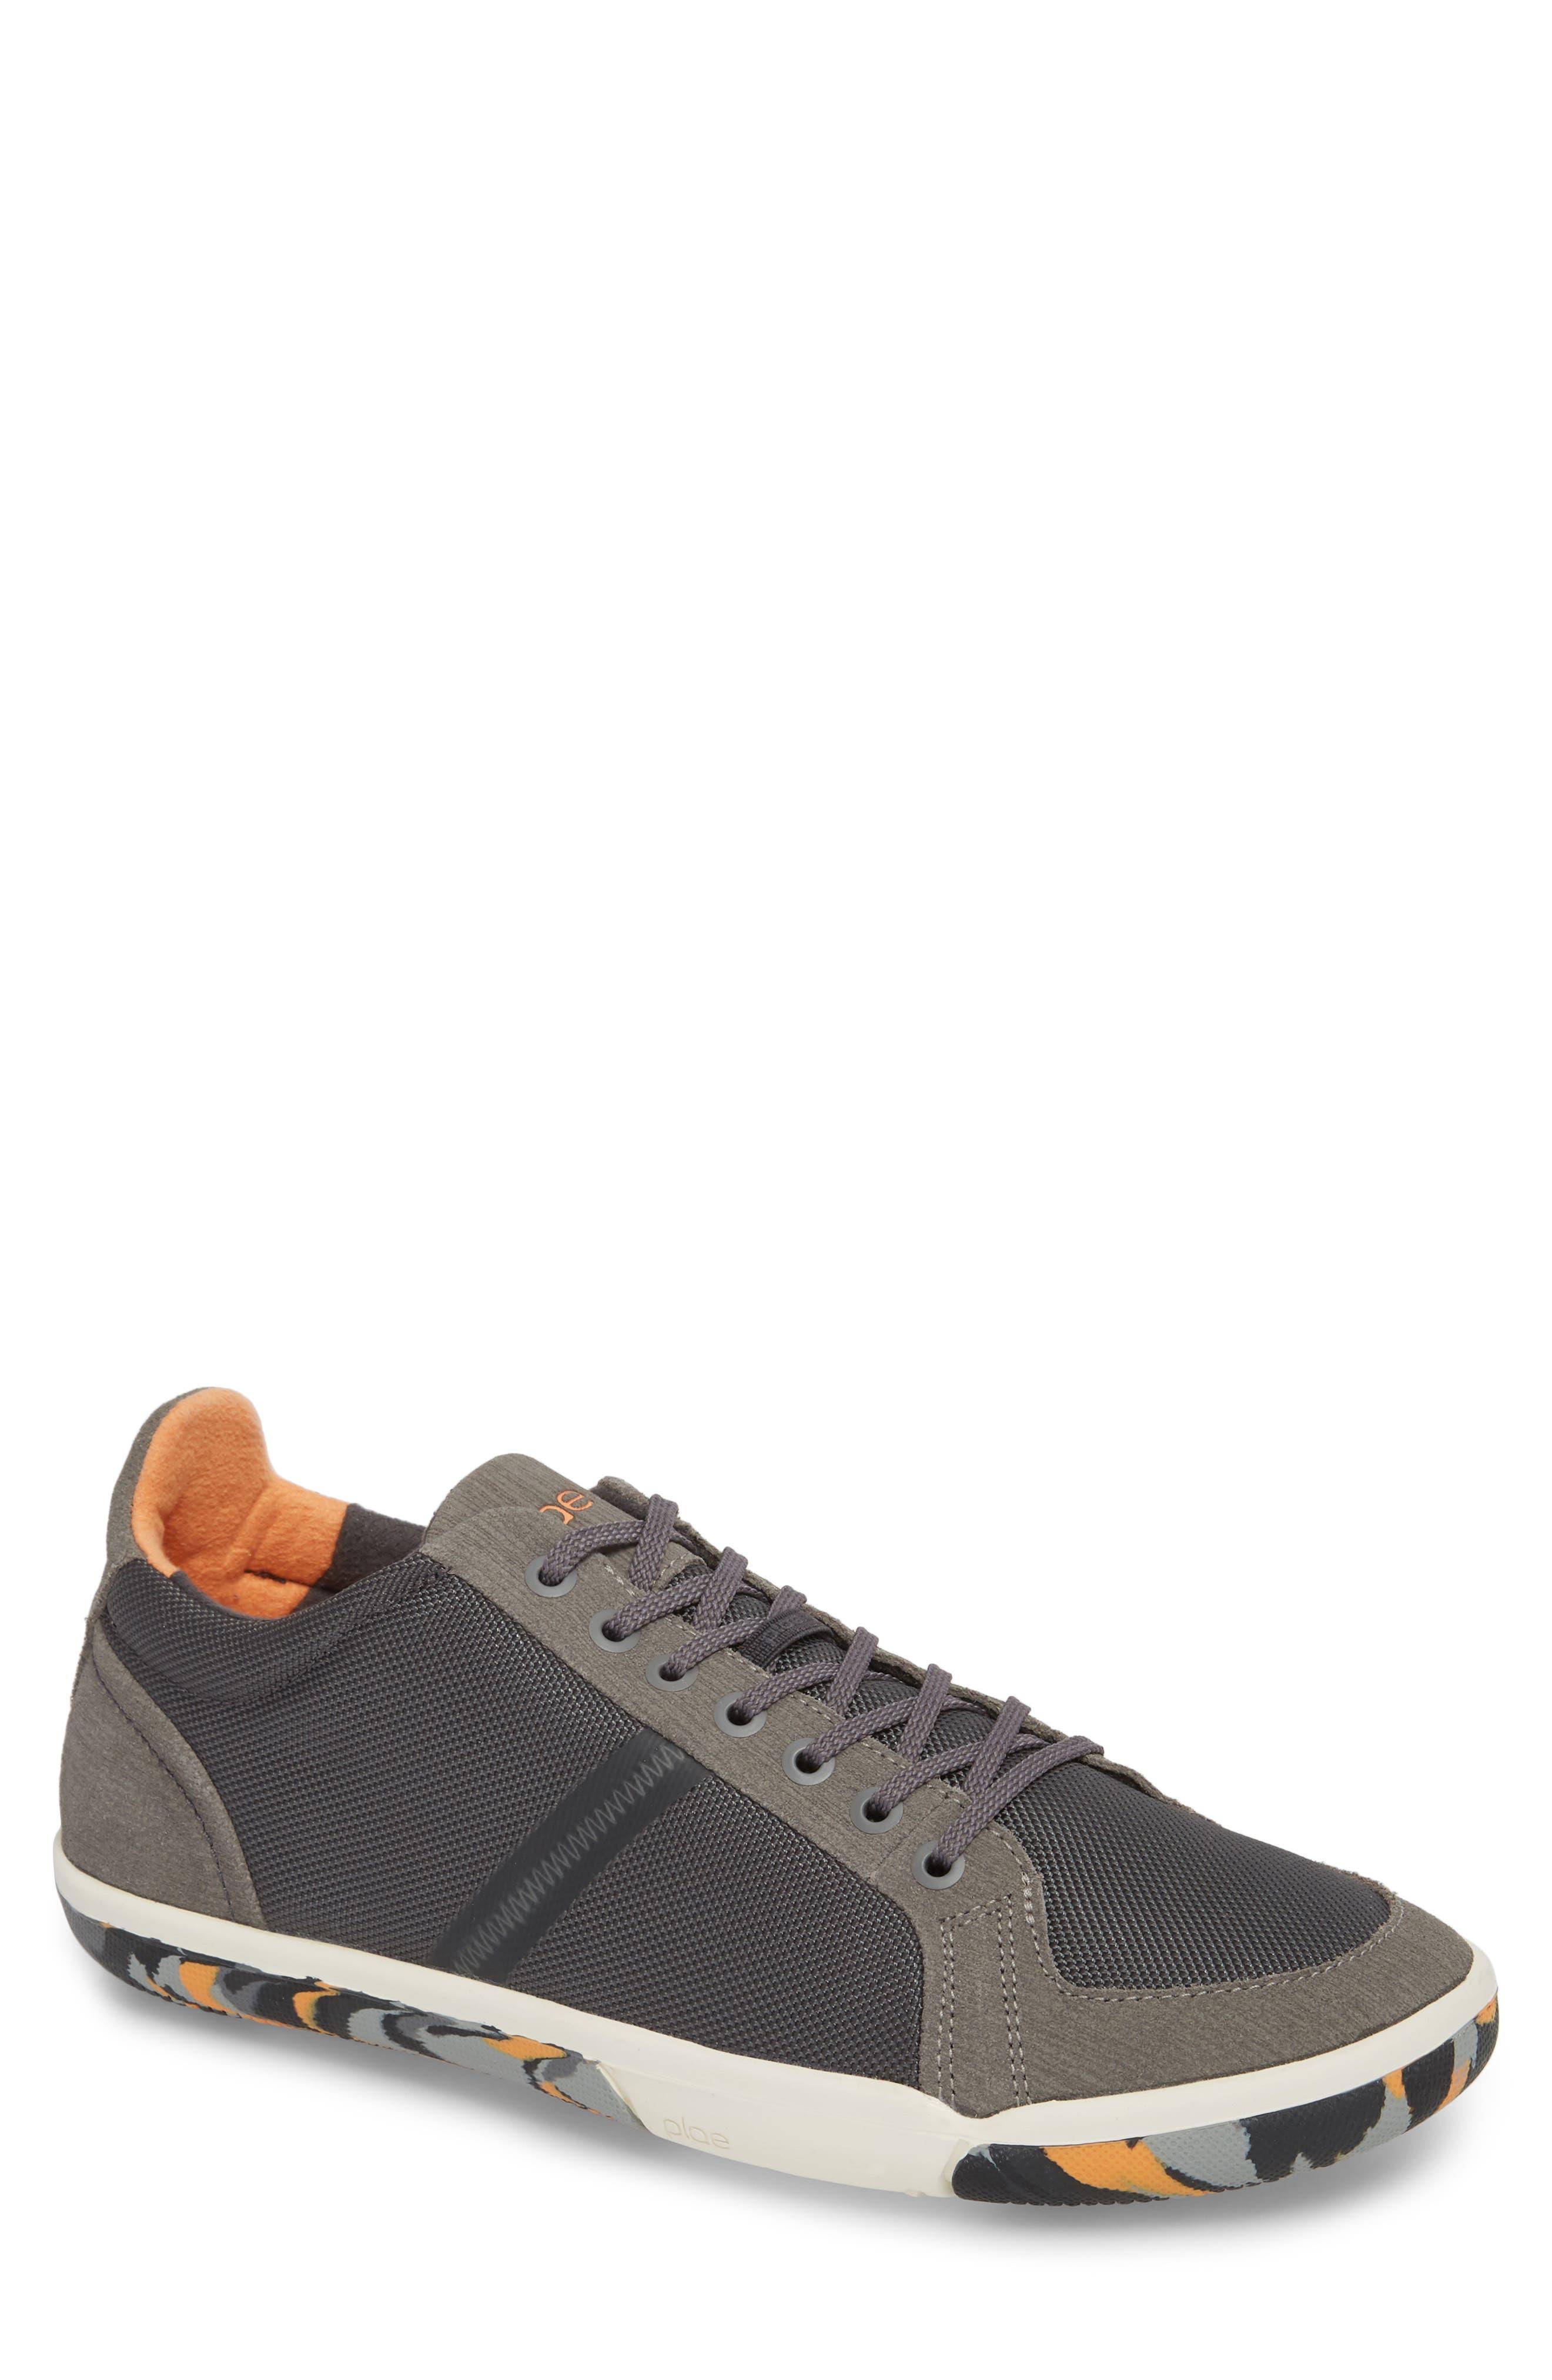 Prospect Low Top Sneaker,                         Main,                         color, 070